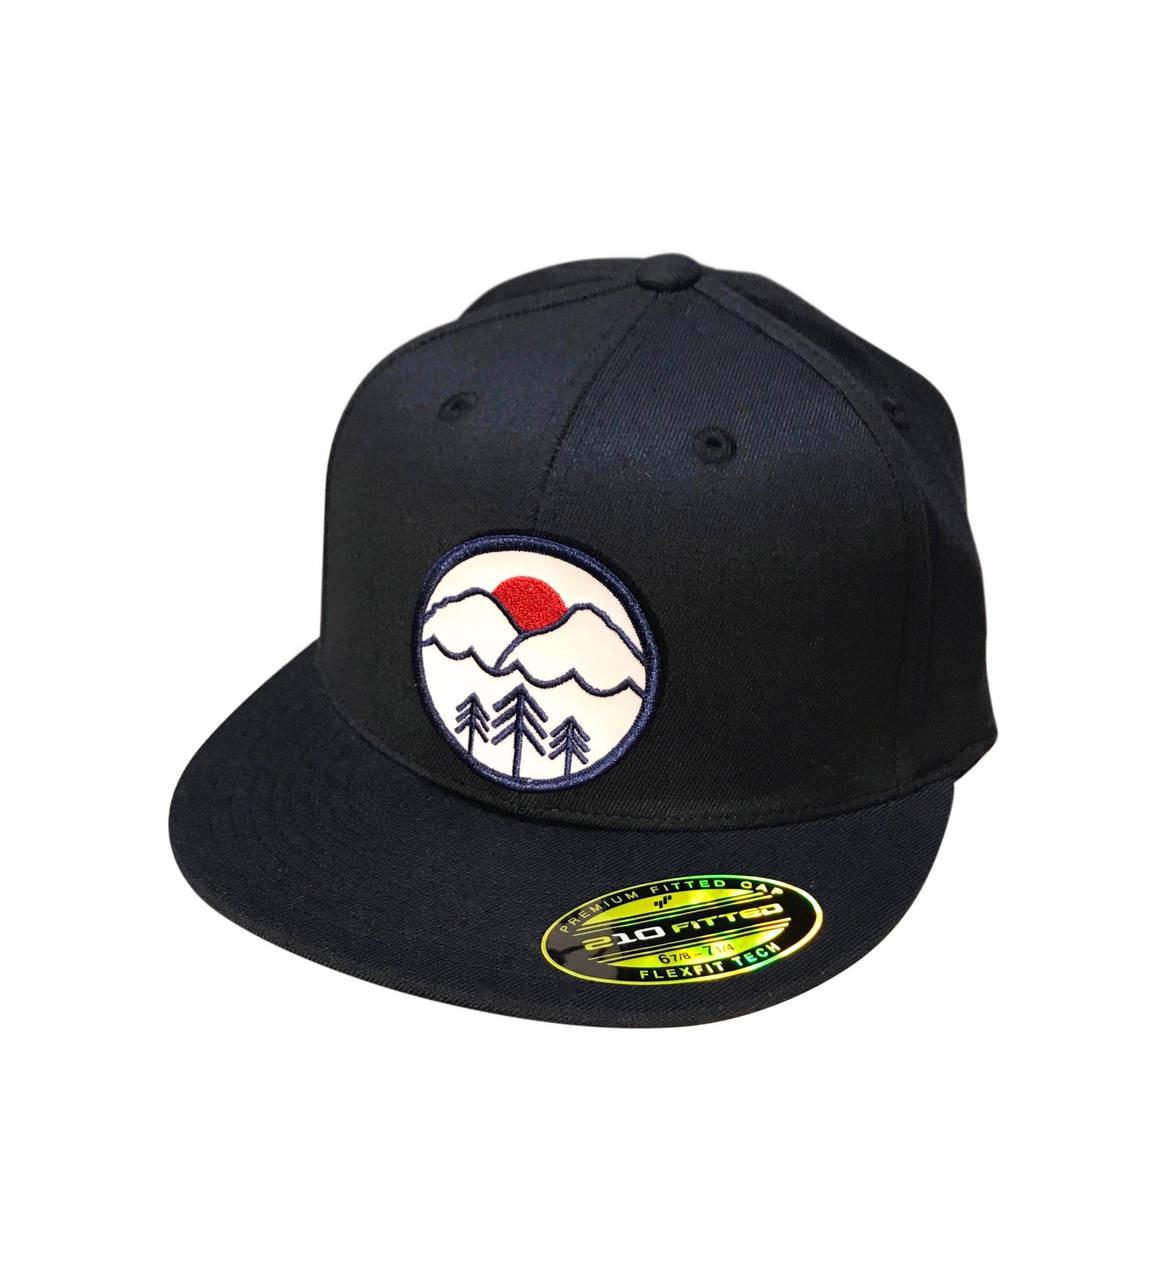 46b14ca078626 Pacific Northwest adult flex fit hat